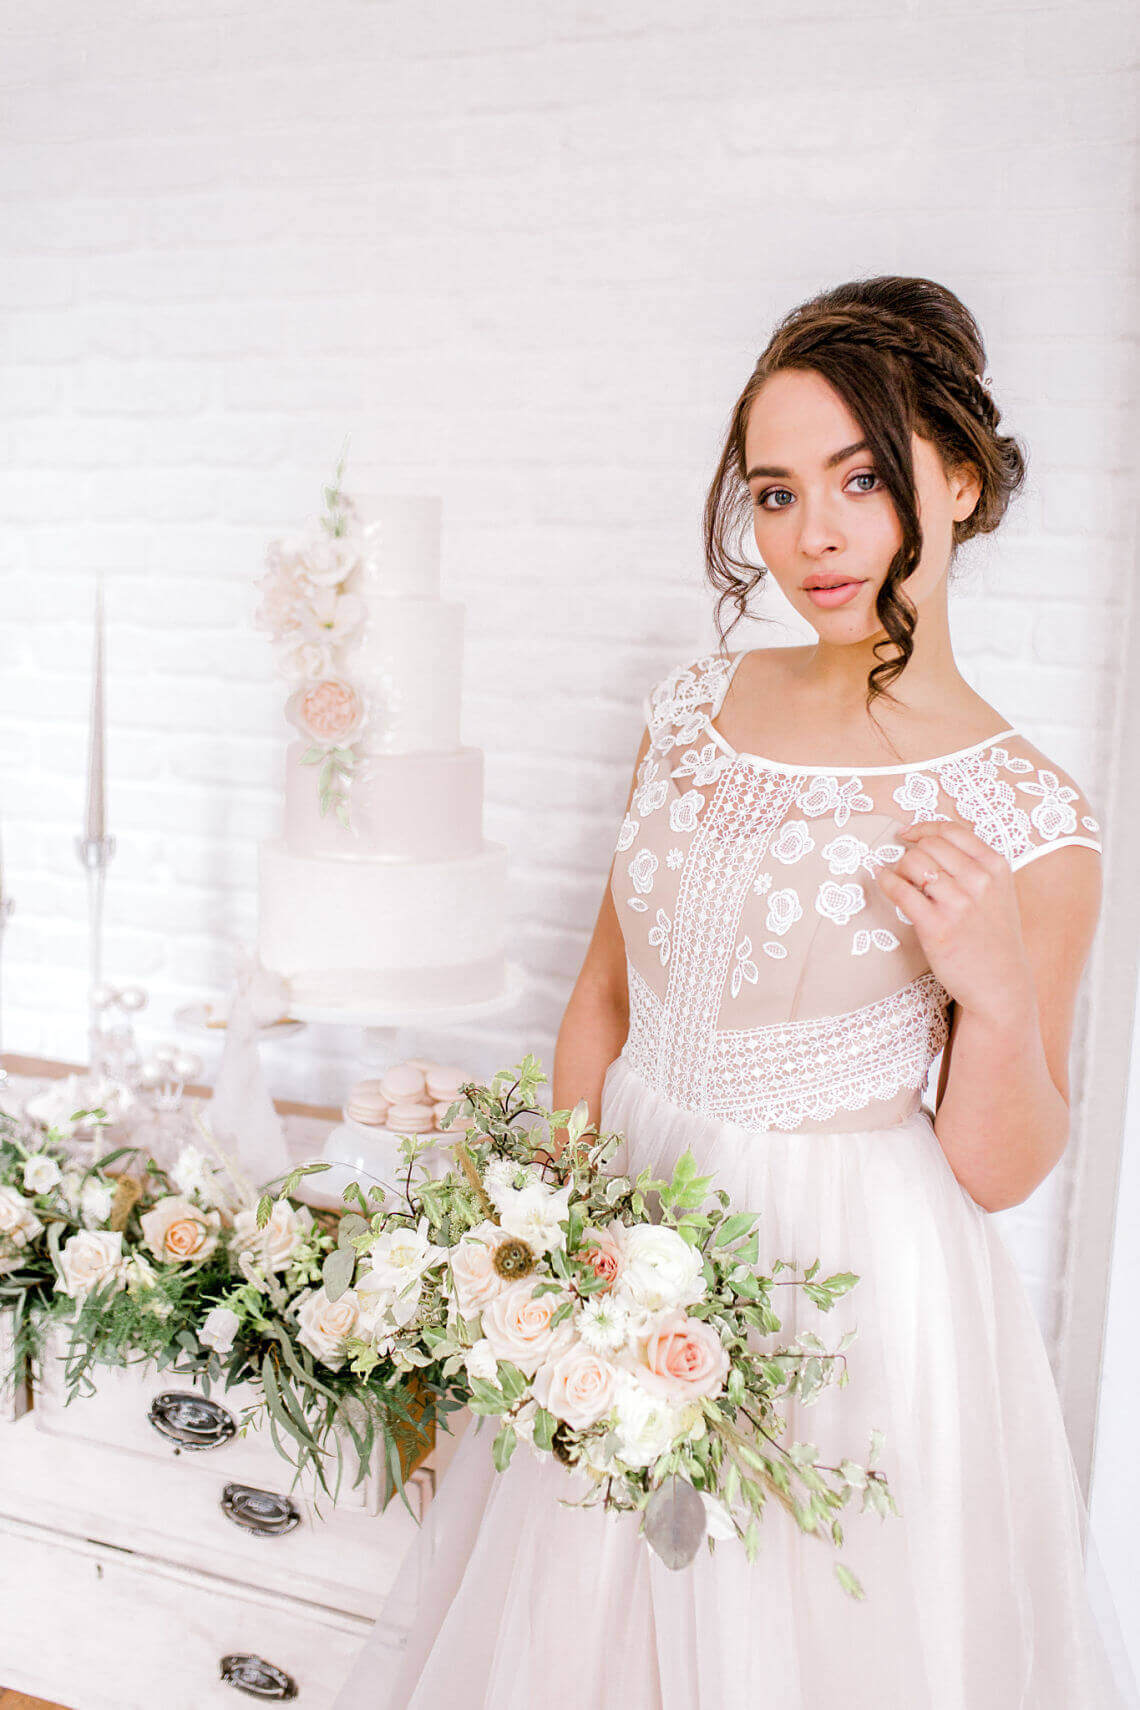 essex-wedding-planner-romantic-bridal-style.jpg